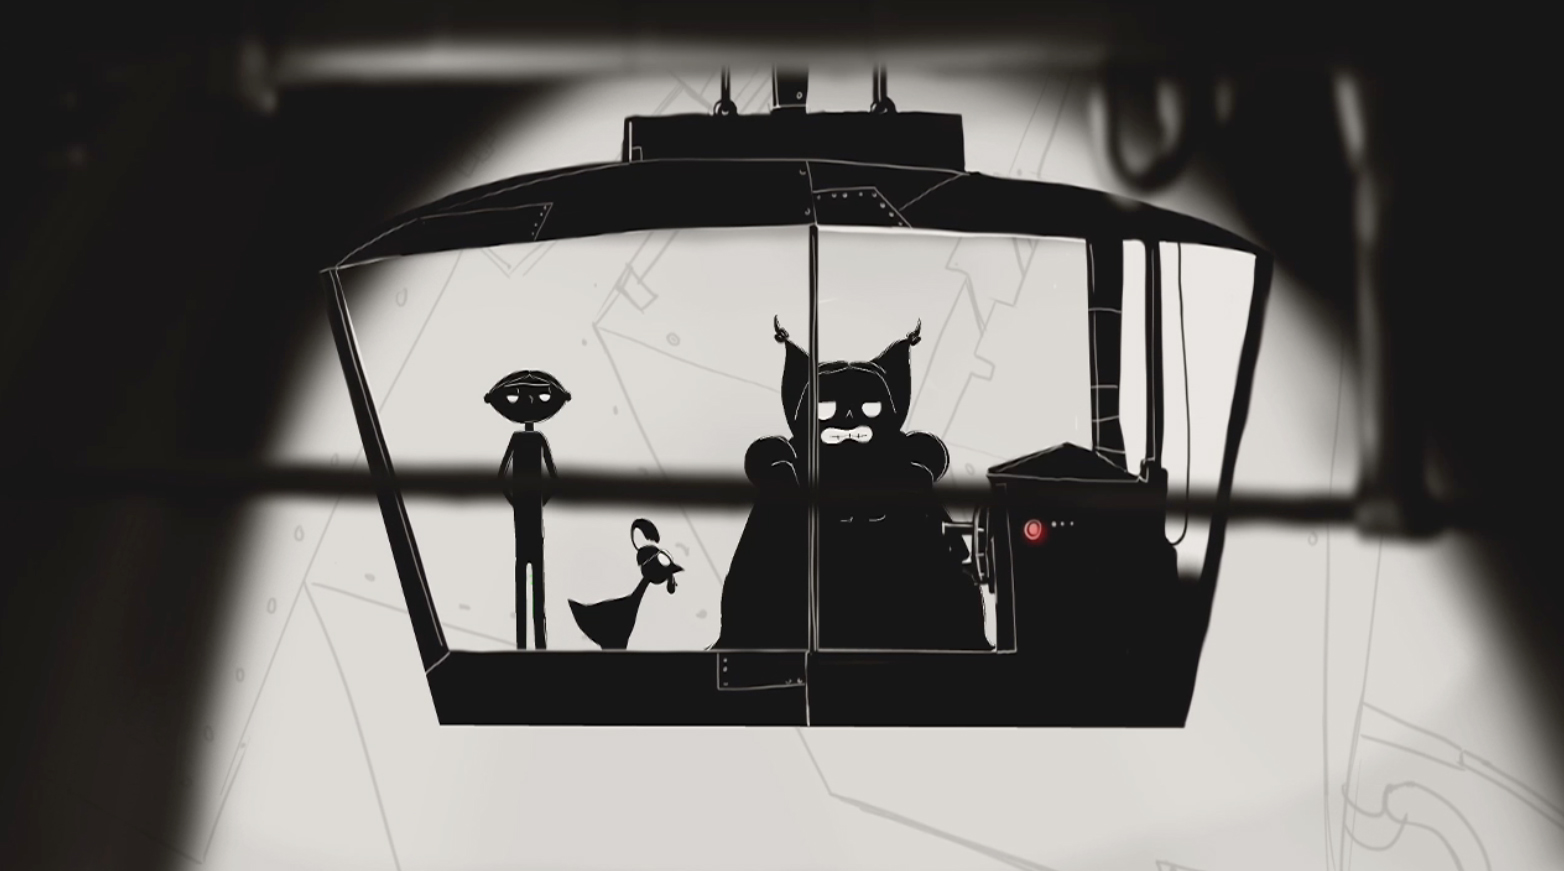 elevator scene 2D animation